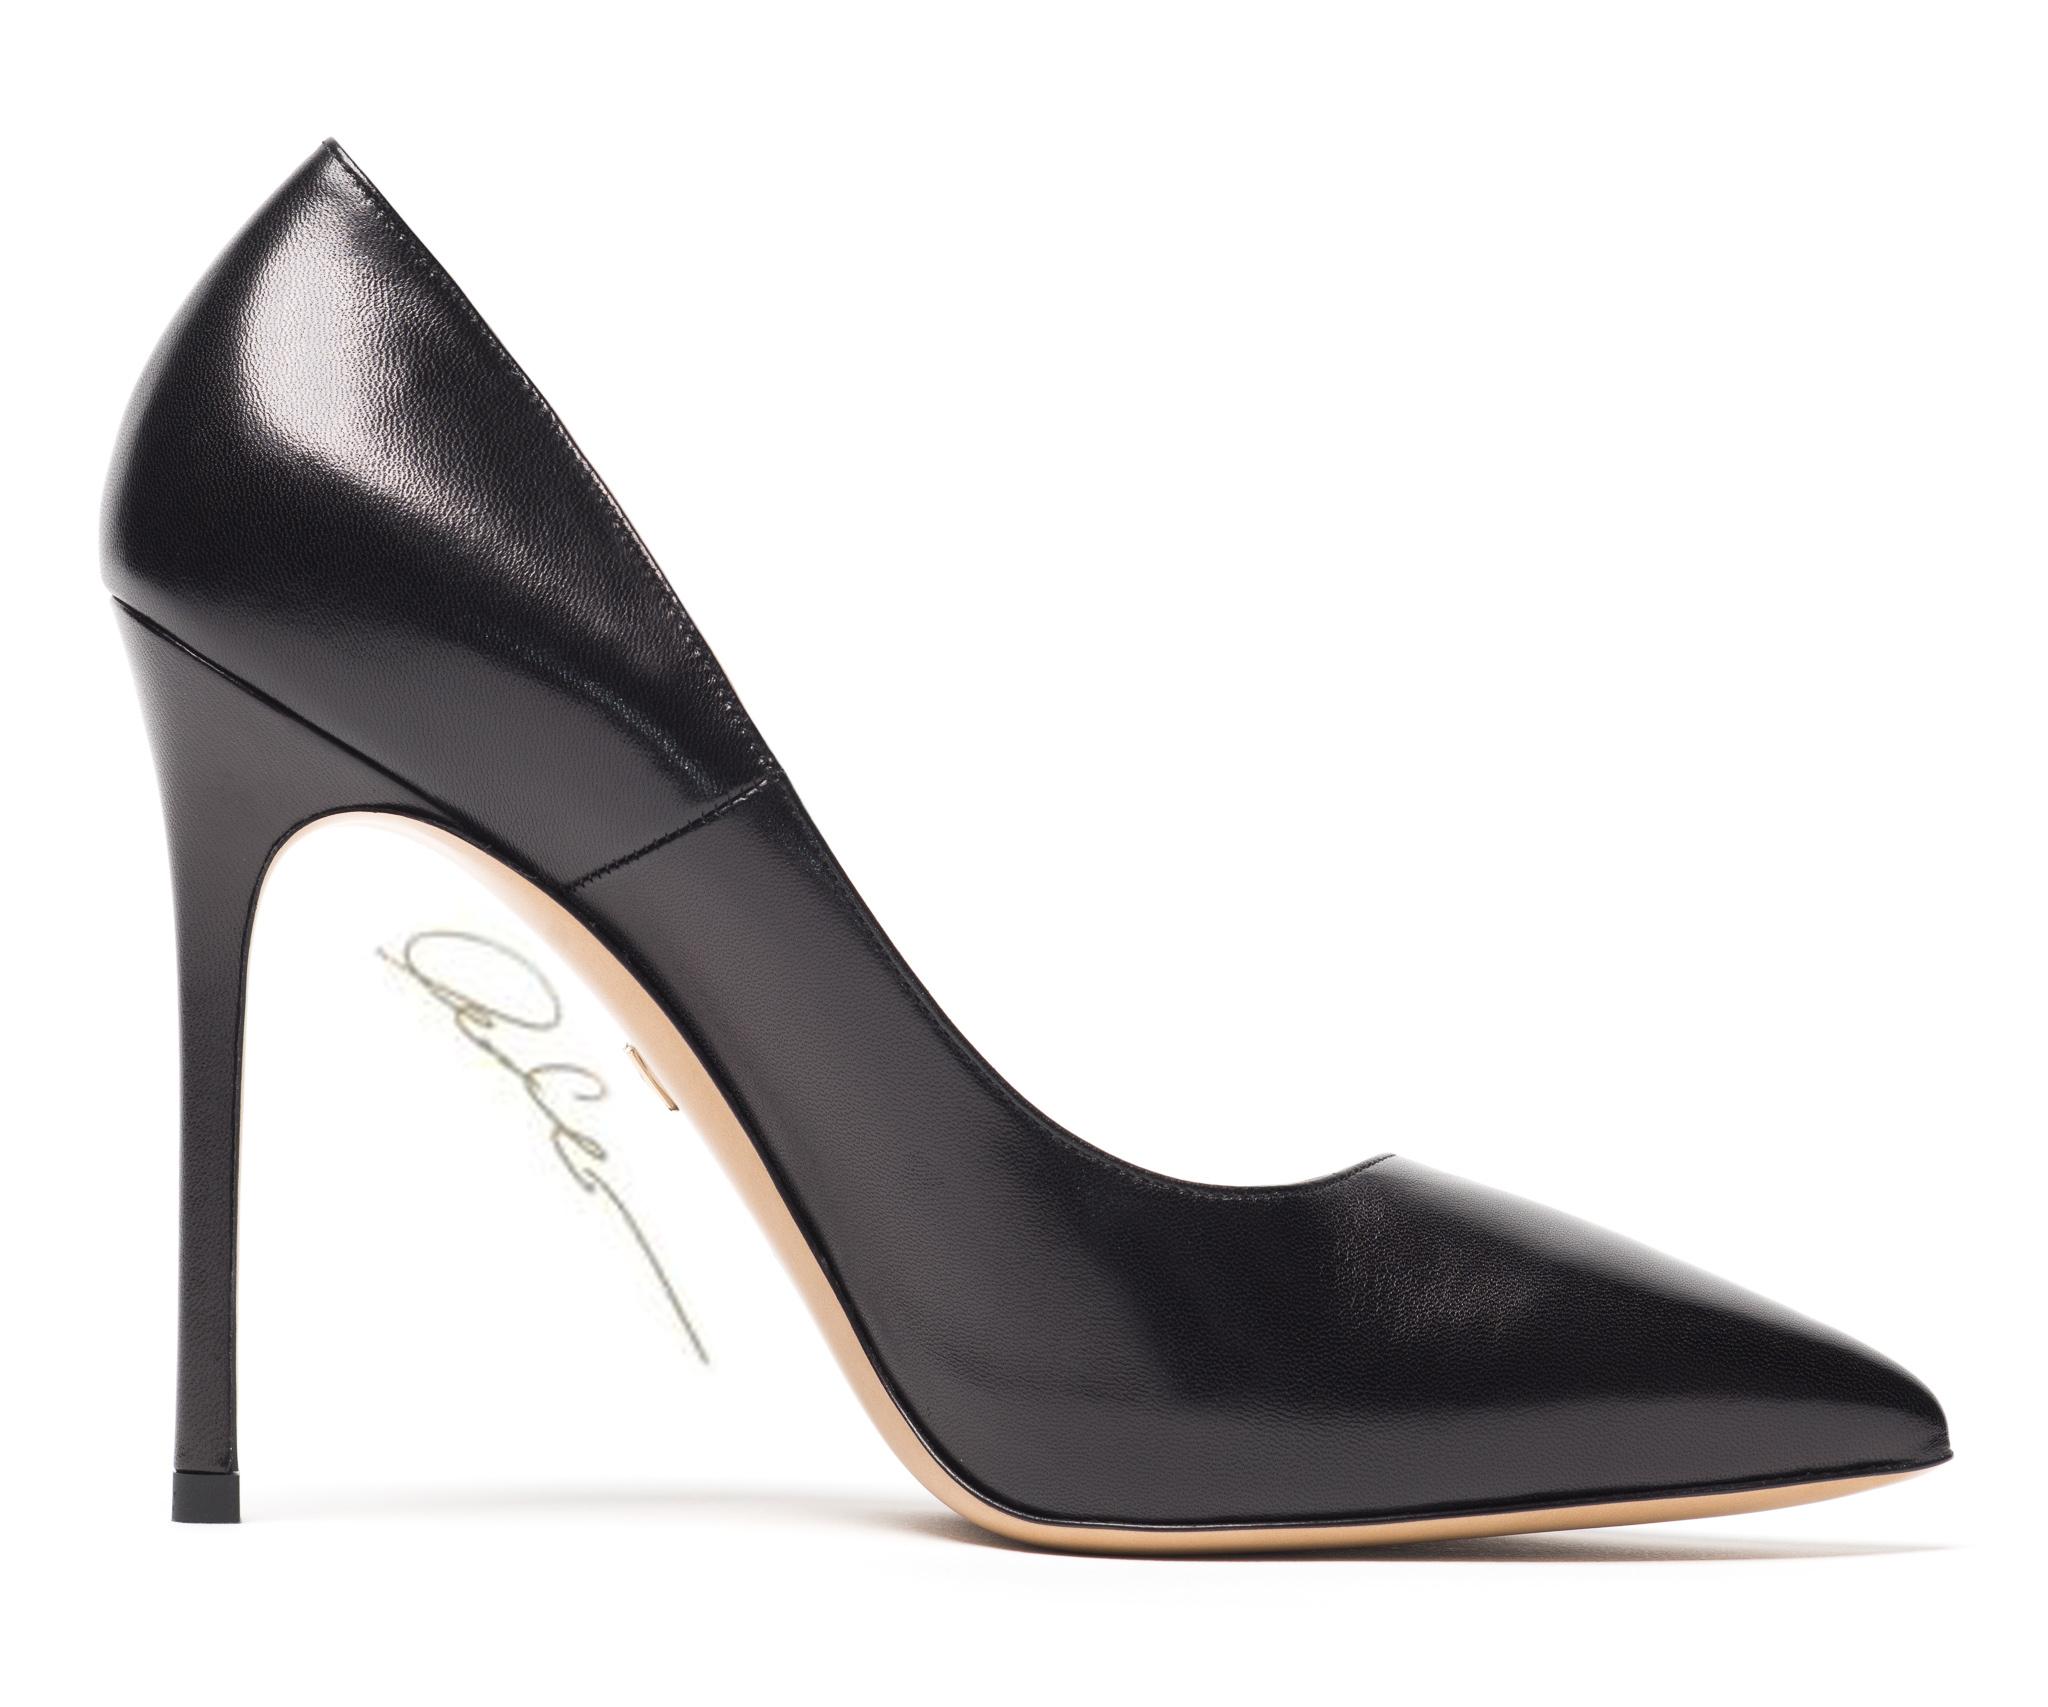 quality design 78422 77f32 Rodeo Drive Collection - High Heel 12 cm - Glattleder - schwarz - spitz